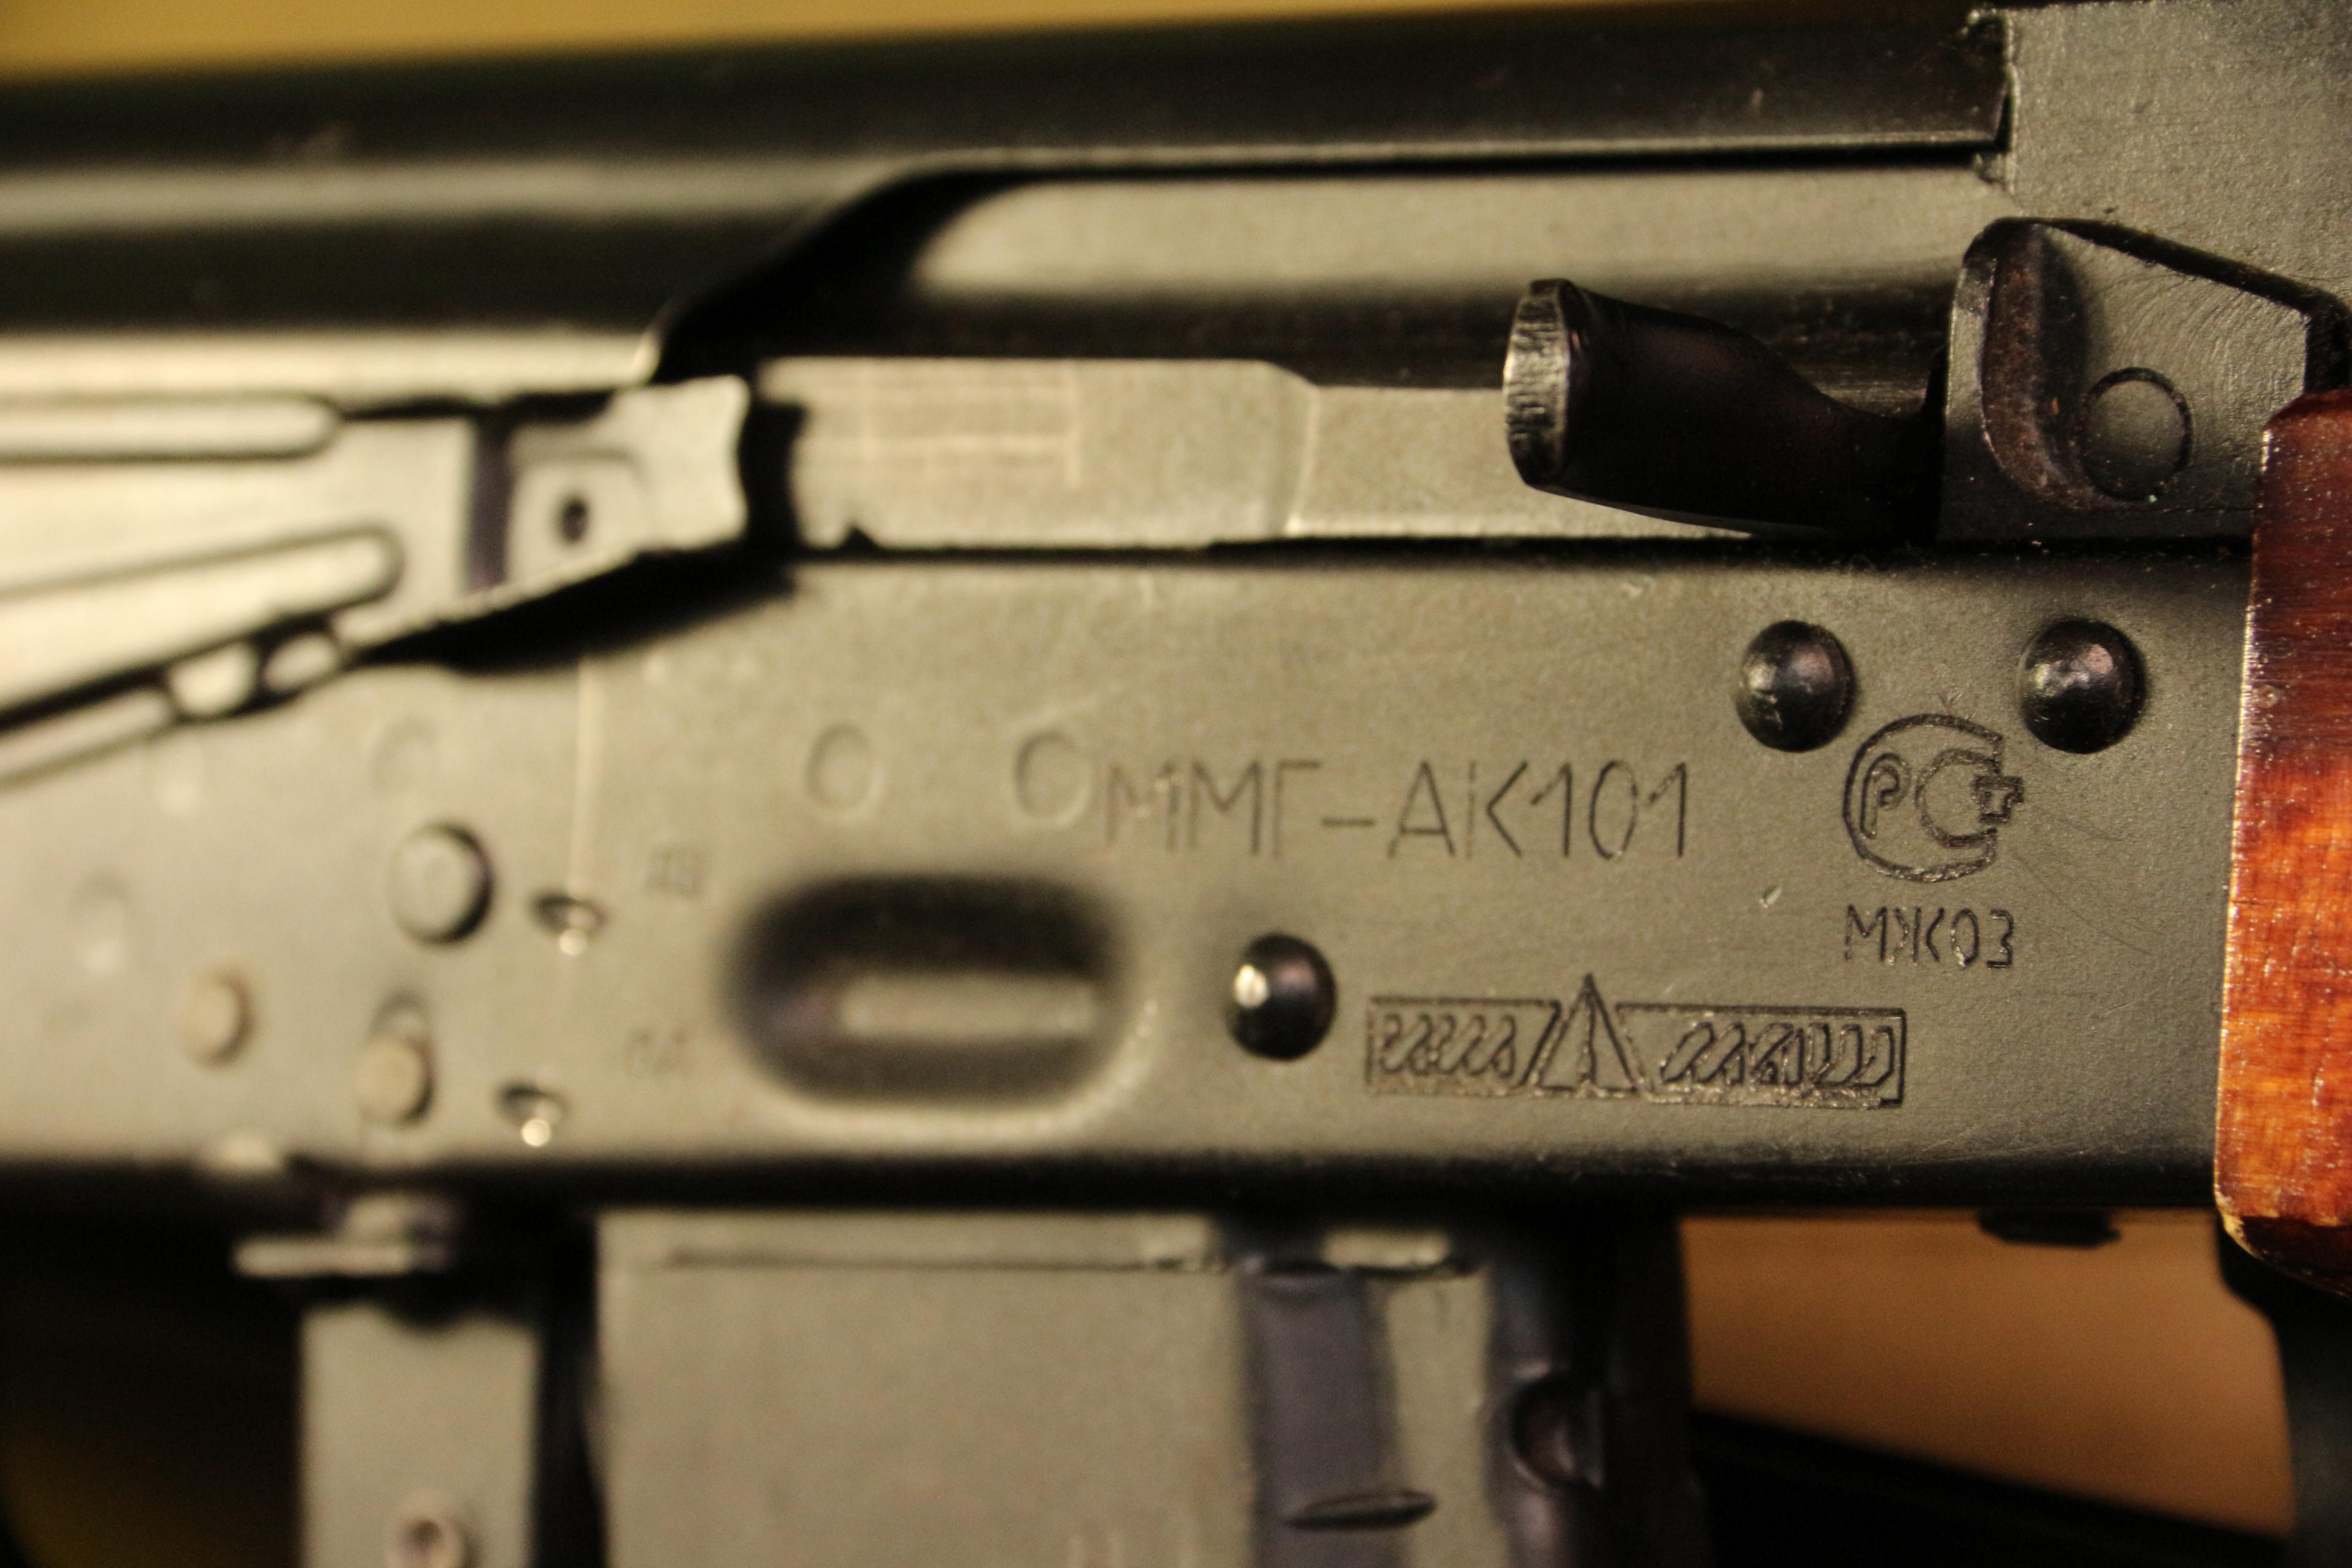 Автомат Калашникова АК-101 5.56х45 №03143974